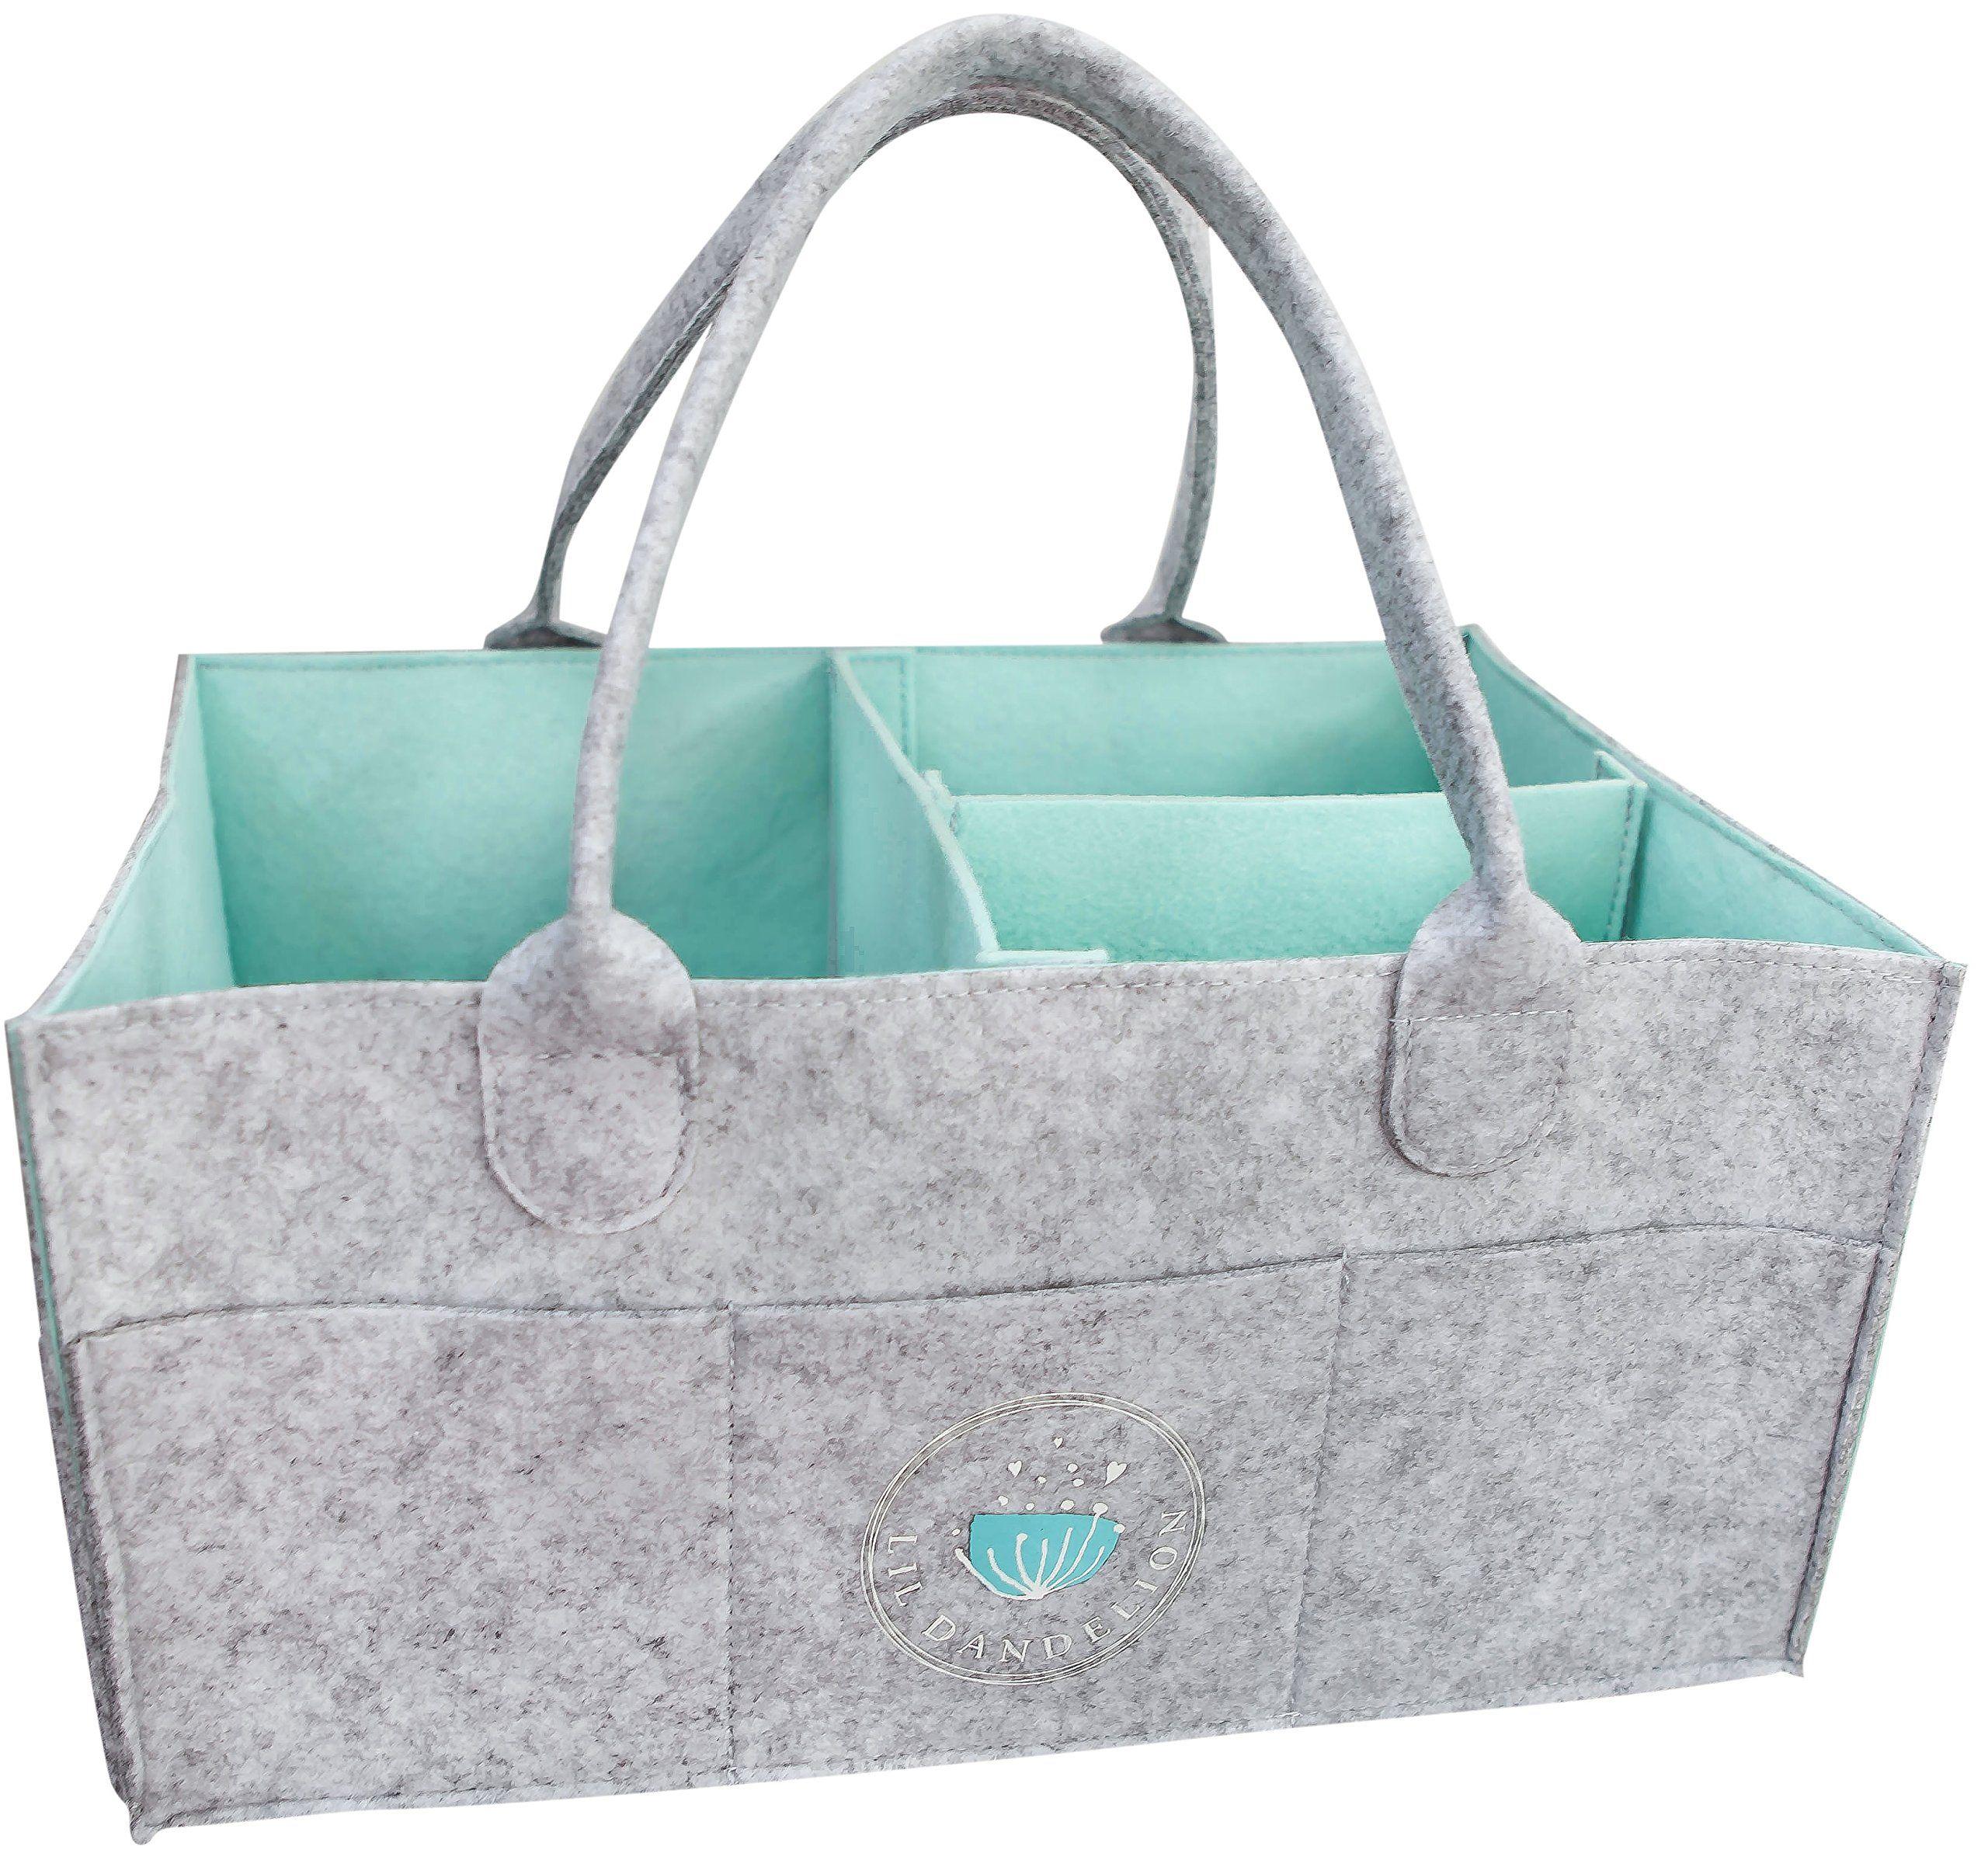 Portable Nursery Changing Car Organiser Bag Diaper Caddy Organiser Nappy Baby Travel Storage Box